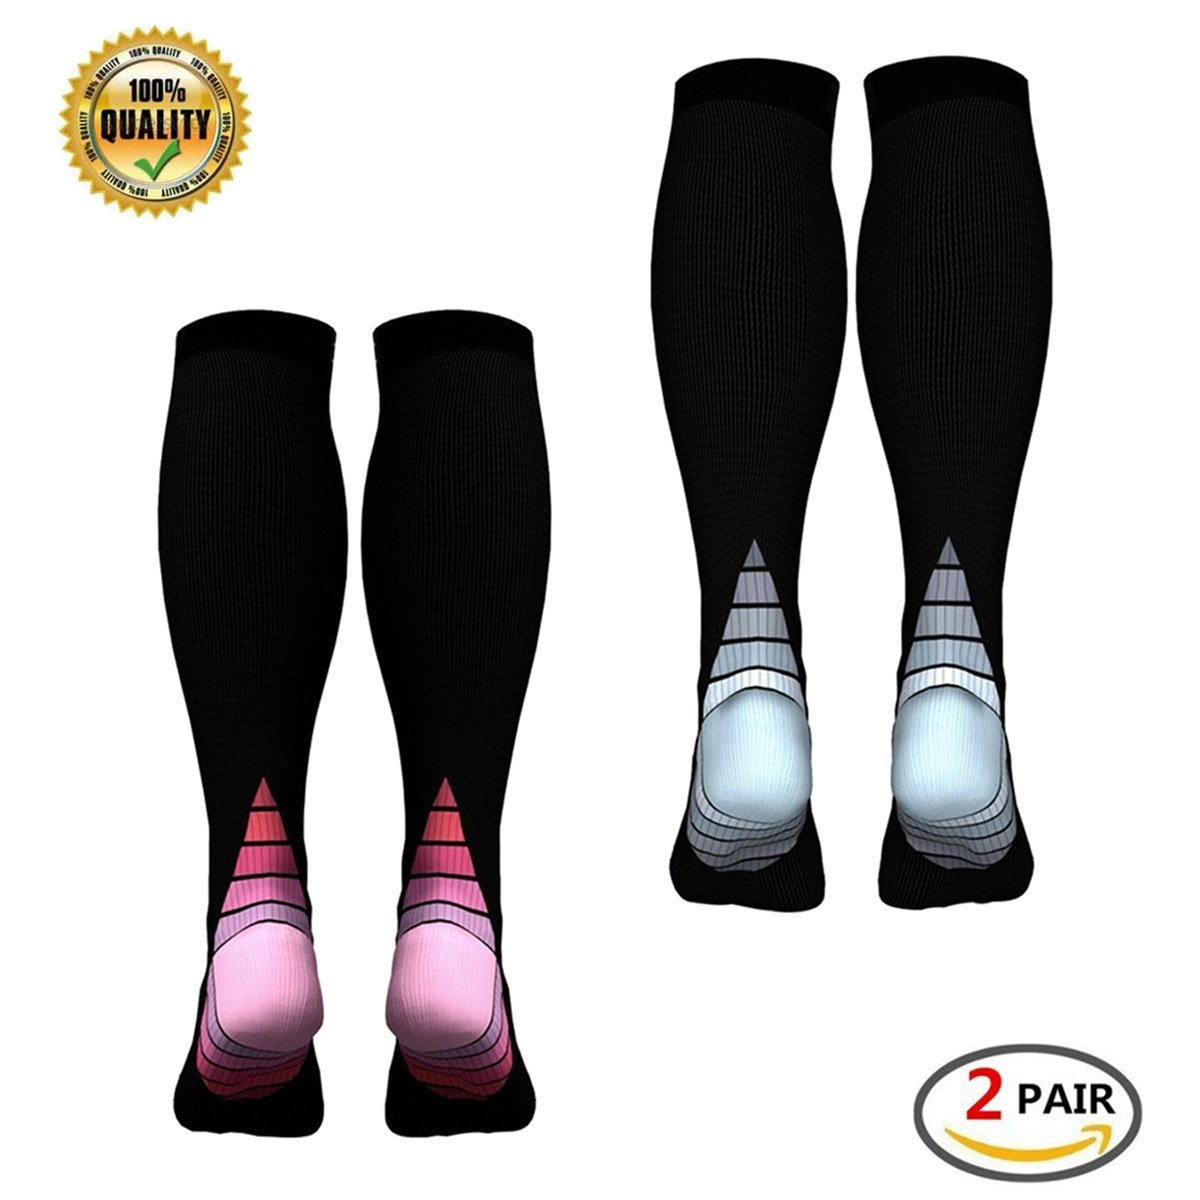 Varicose Veins Best Footless Compression Socks for Running Flight Travel Pregnancy Flying Nurses Medical Shin Splints Boost Stamina 2 Pairs Graduated Calf Compression Sleeves for Men /& Women